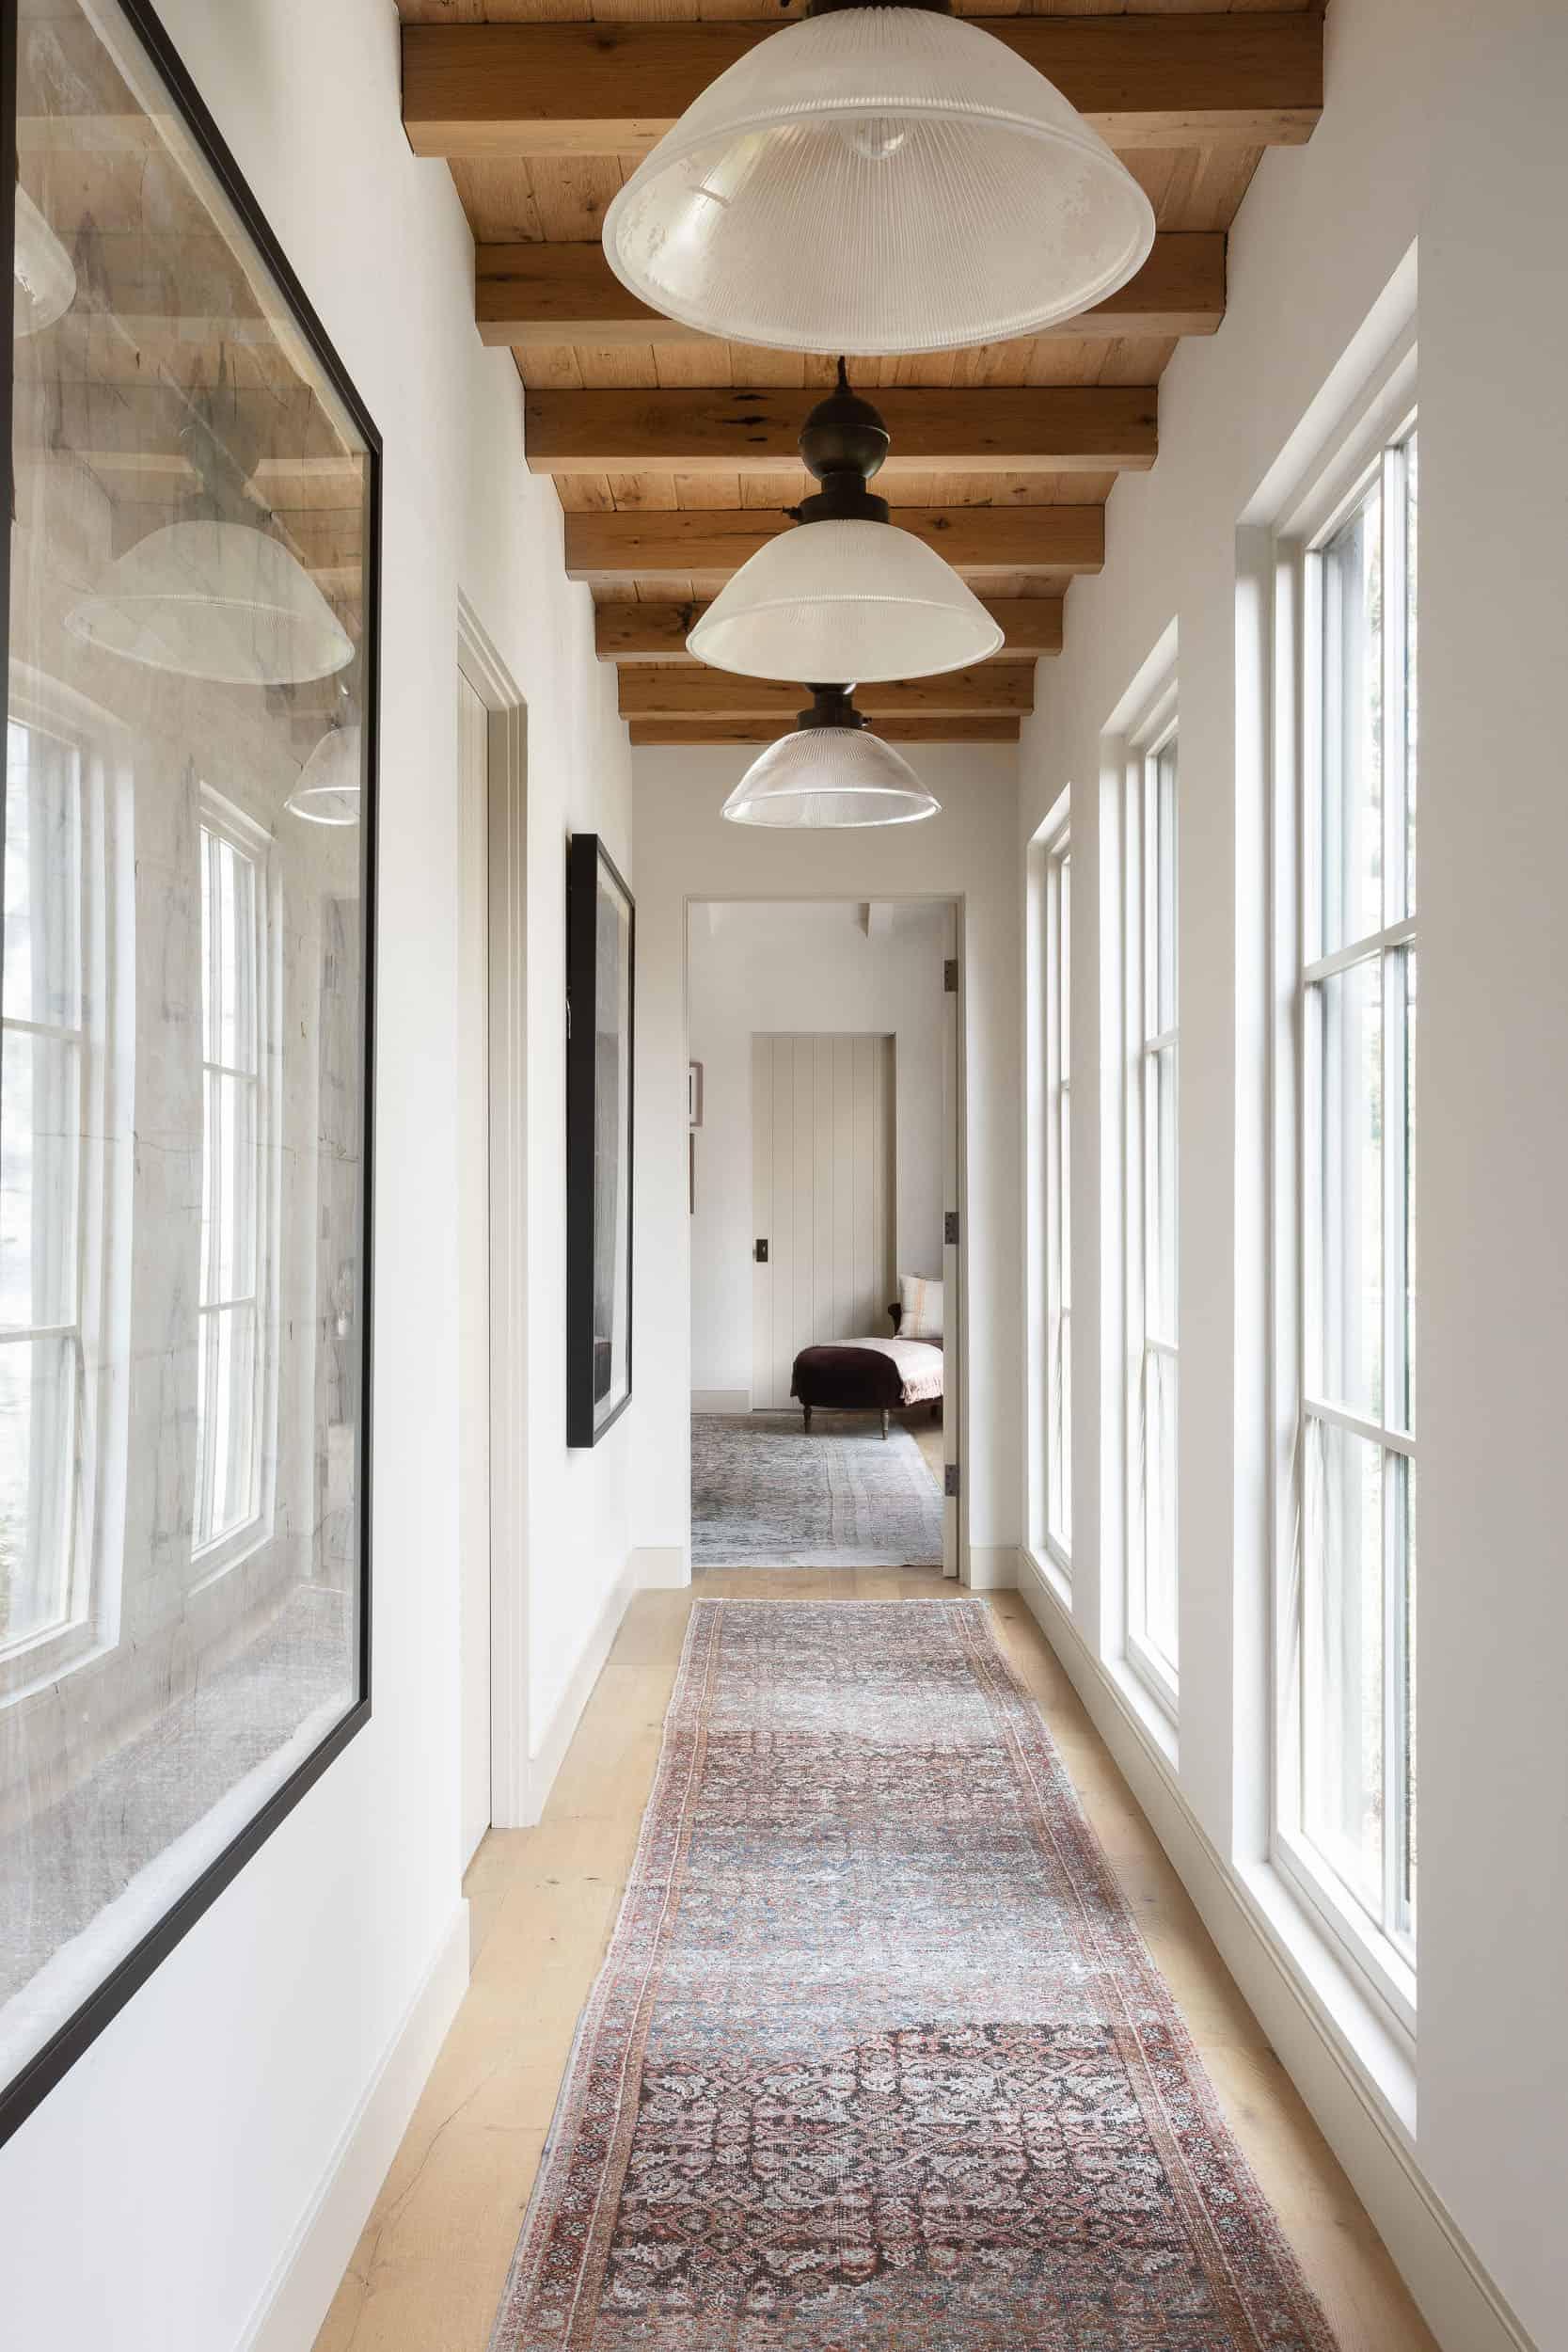 hodnik u stilu zapadne obale